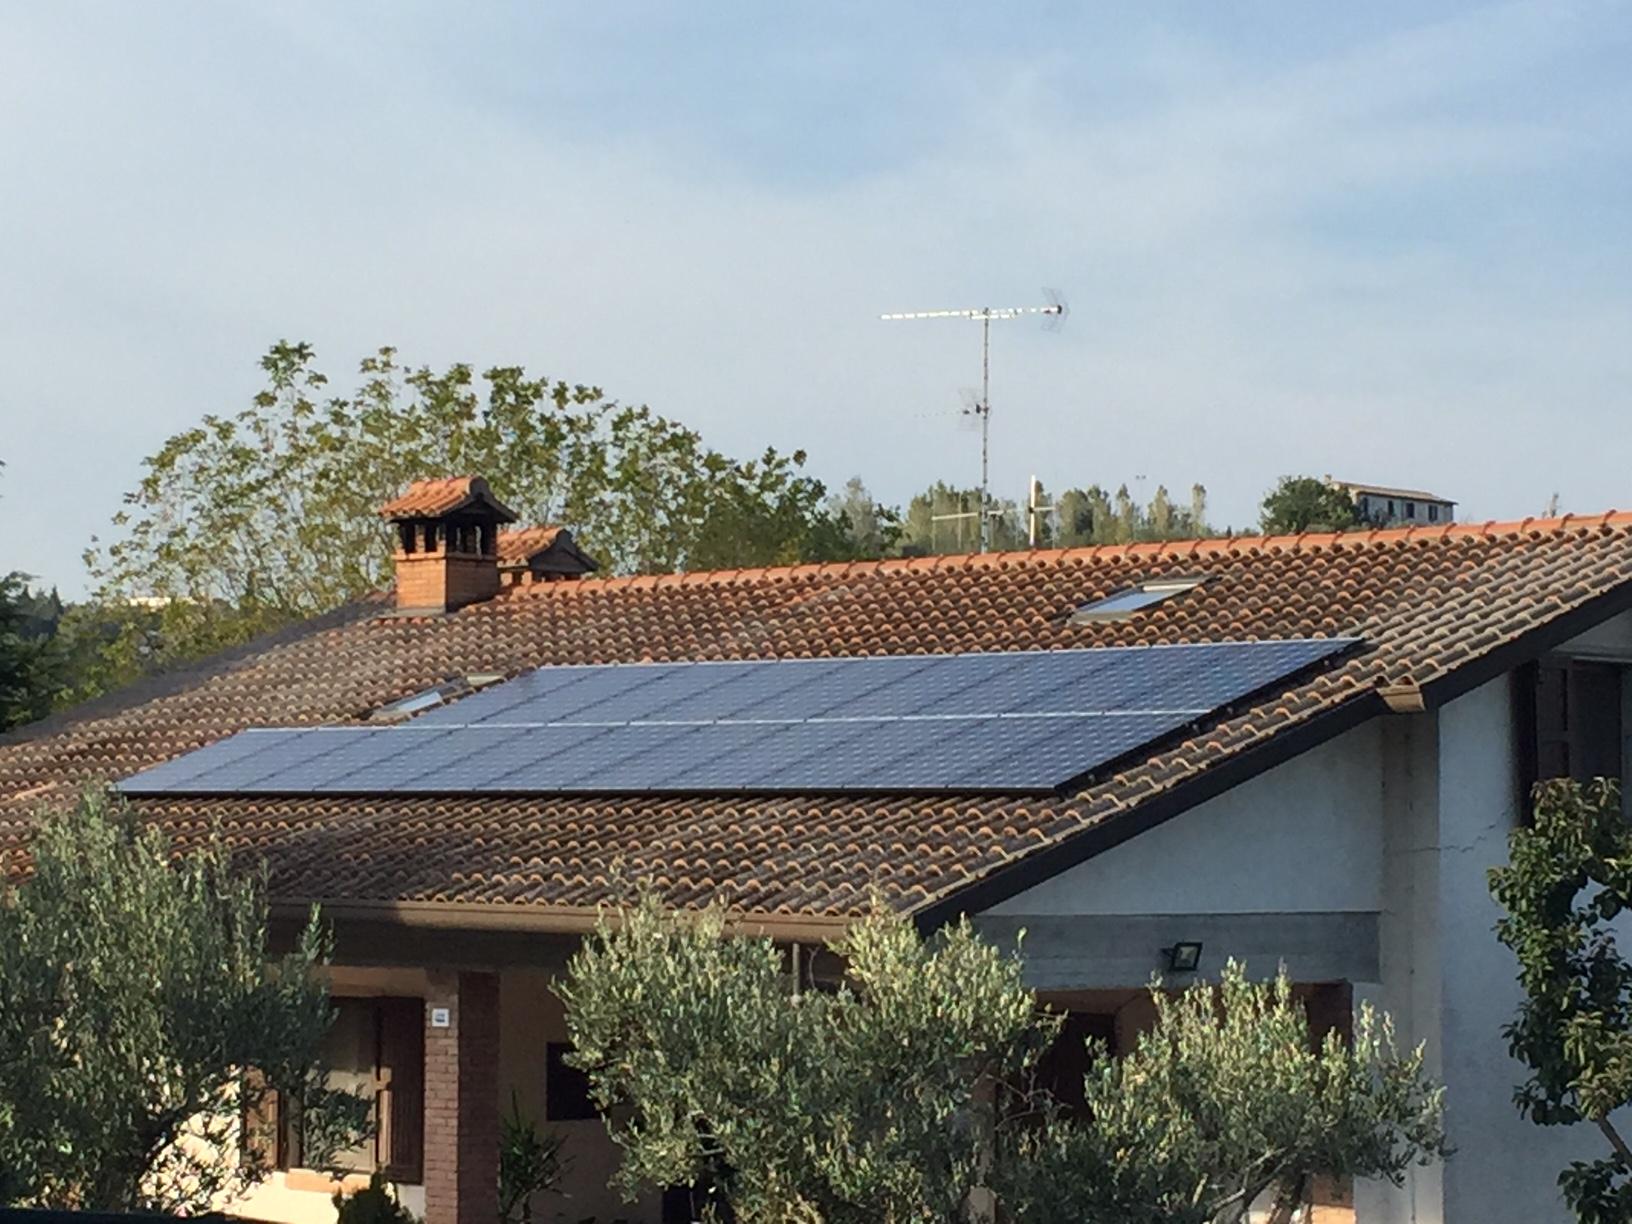 Impianto Fotovoltaico da 6kWp - Cesena (FC) - soetech.it